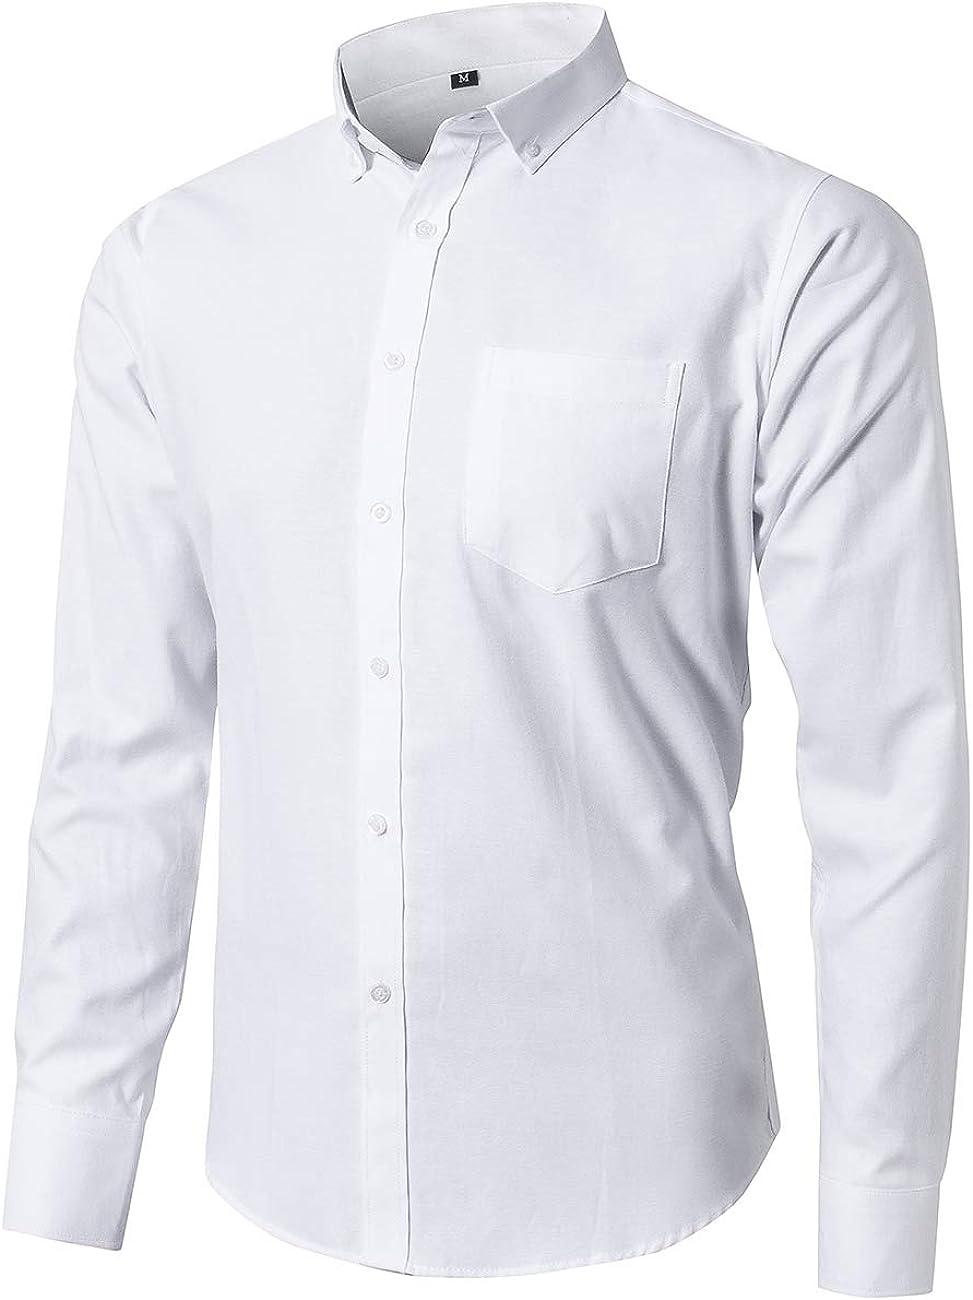 JEETOO Oxford Dress Shirts for Men Long Sleeve Button Down Shirt